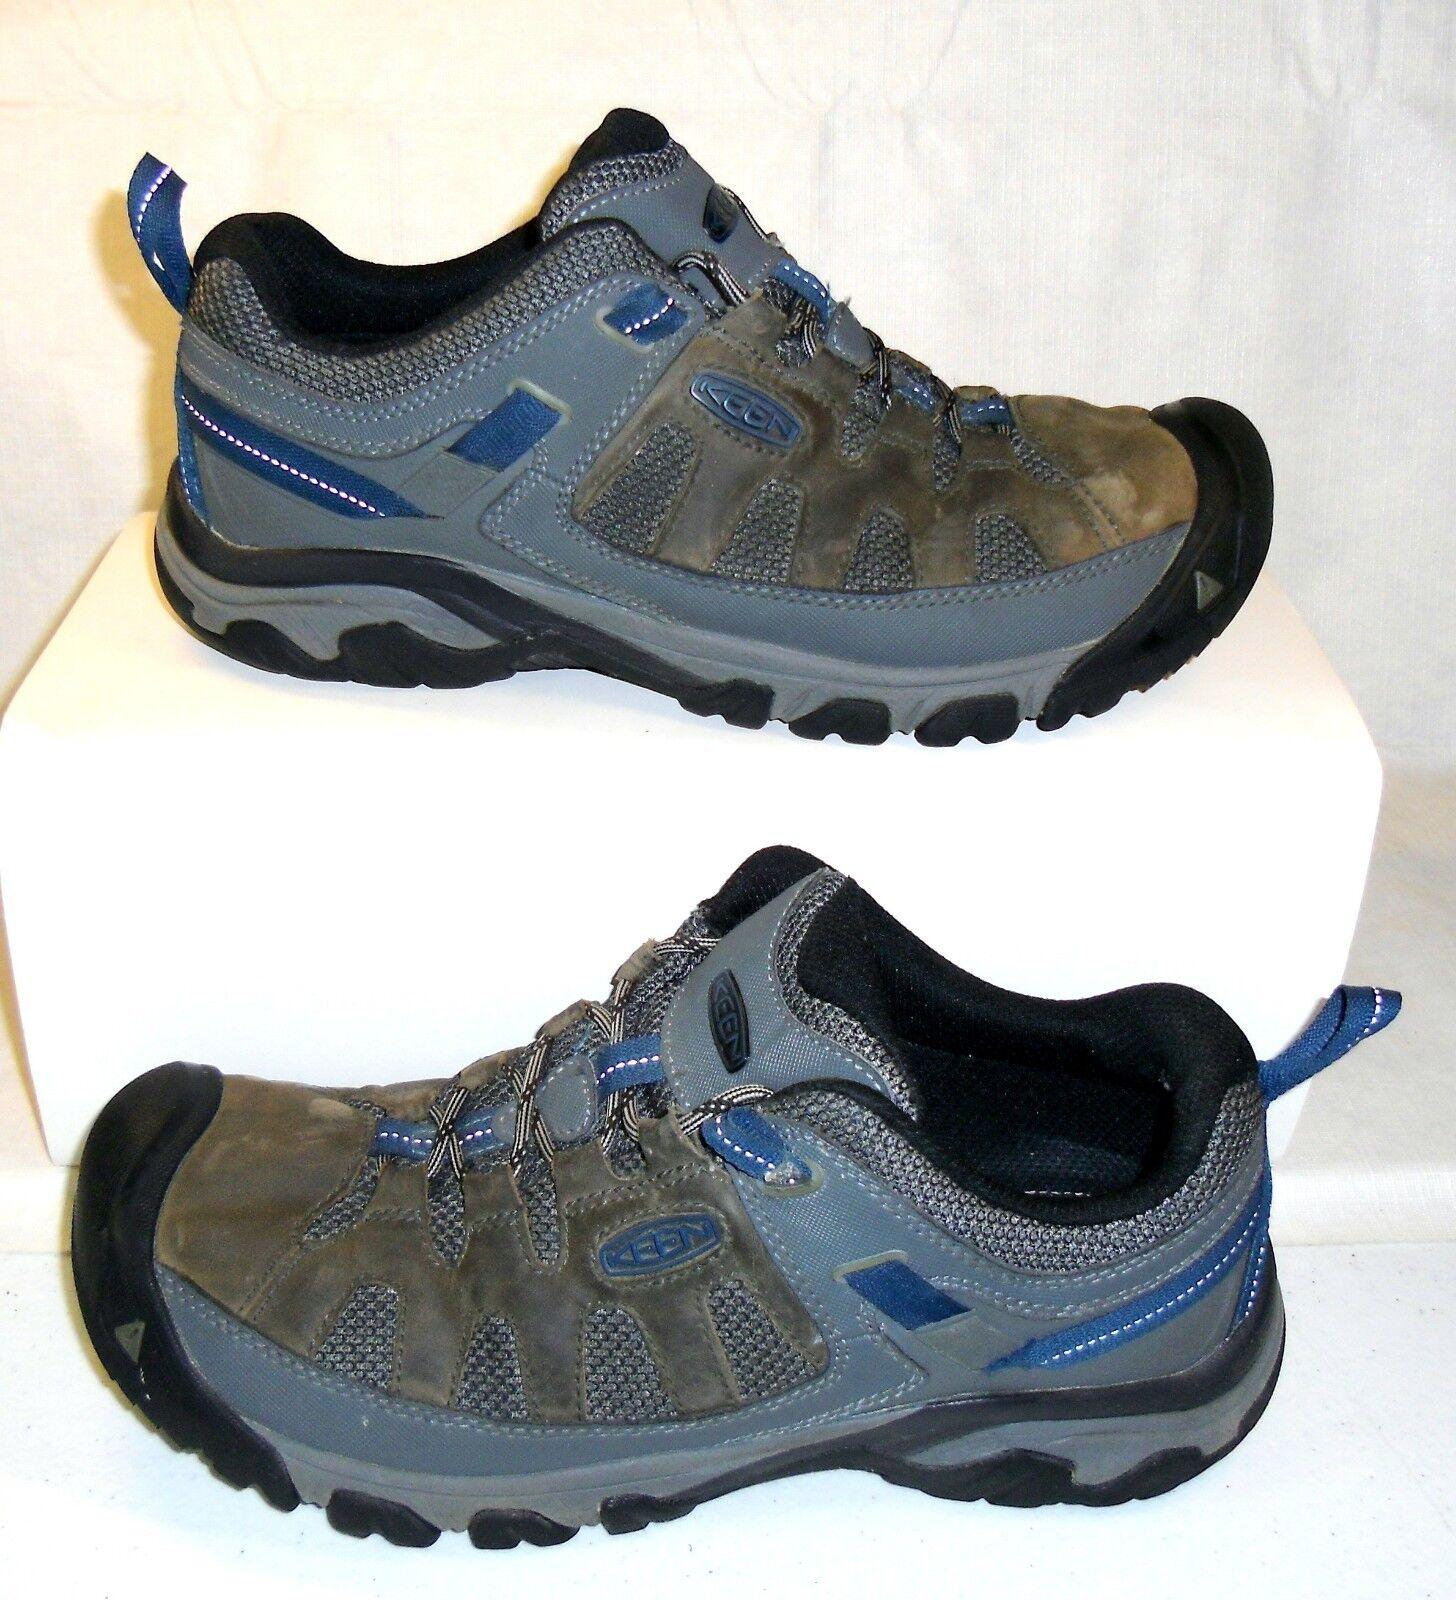 KEEN 1018576 Men's Targhee Vent Trail Hiking Walking shoes Brown bluee US Size 11